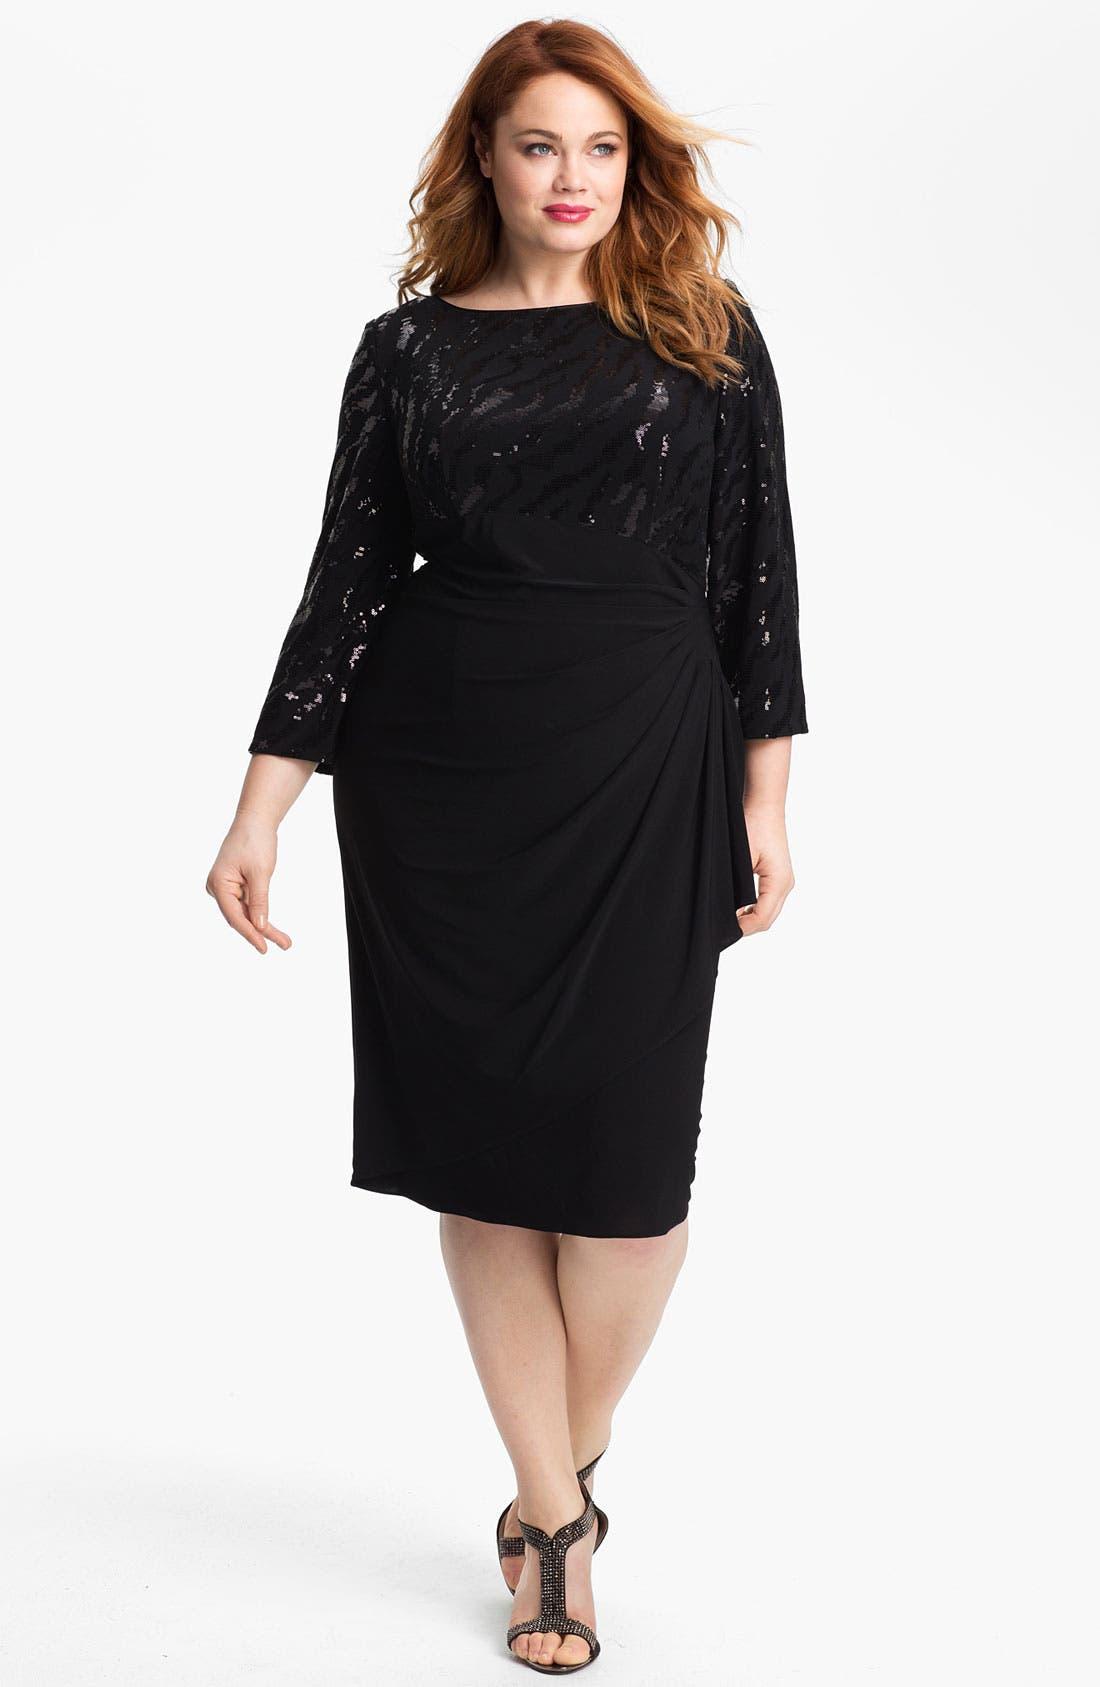 Alternate Image 1 Selected - Alex Evenings Embellished Ruched Jersey Dress (Plus)